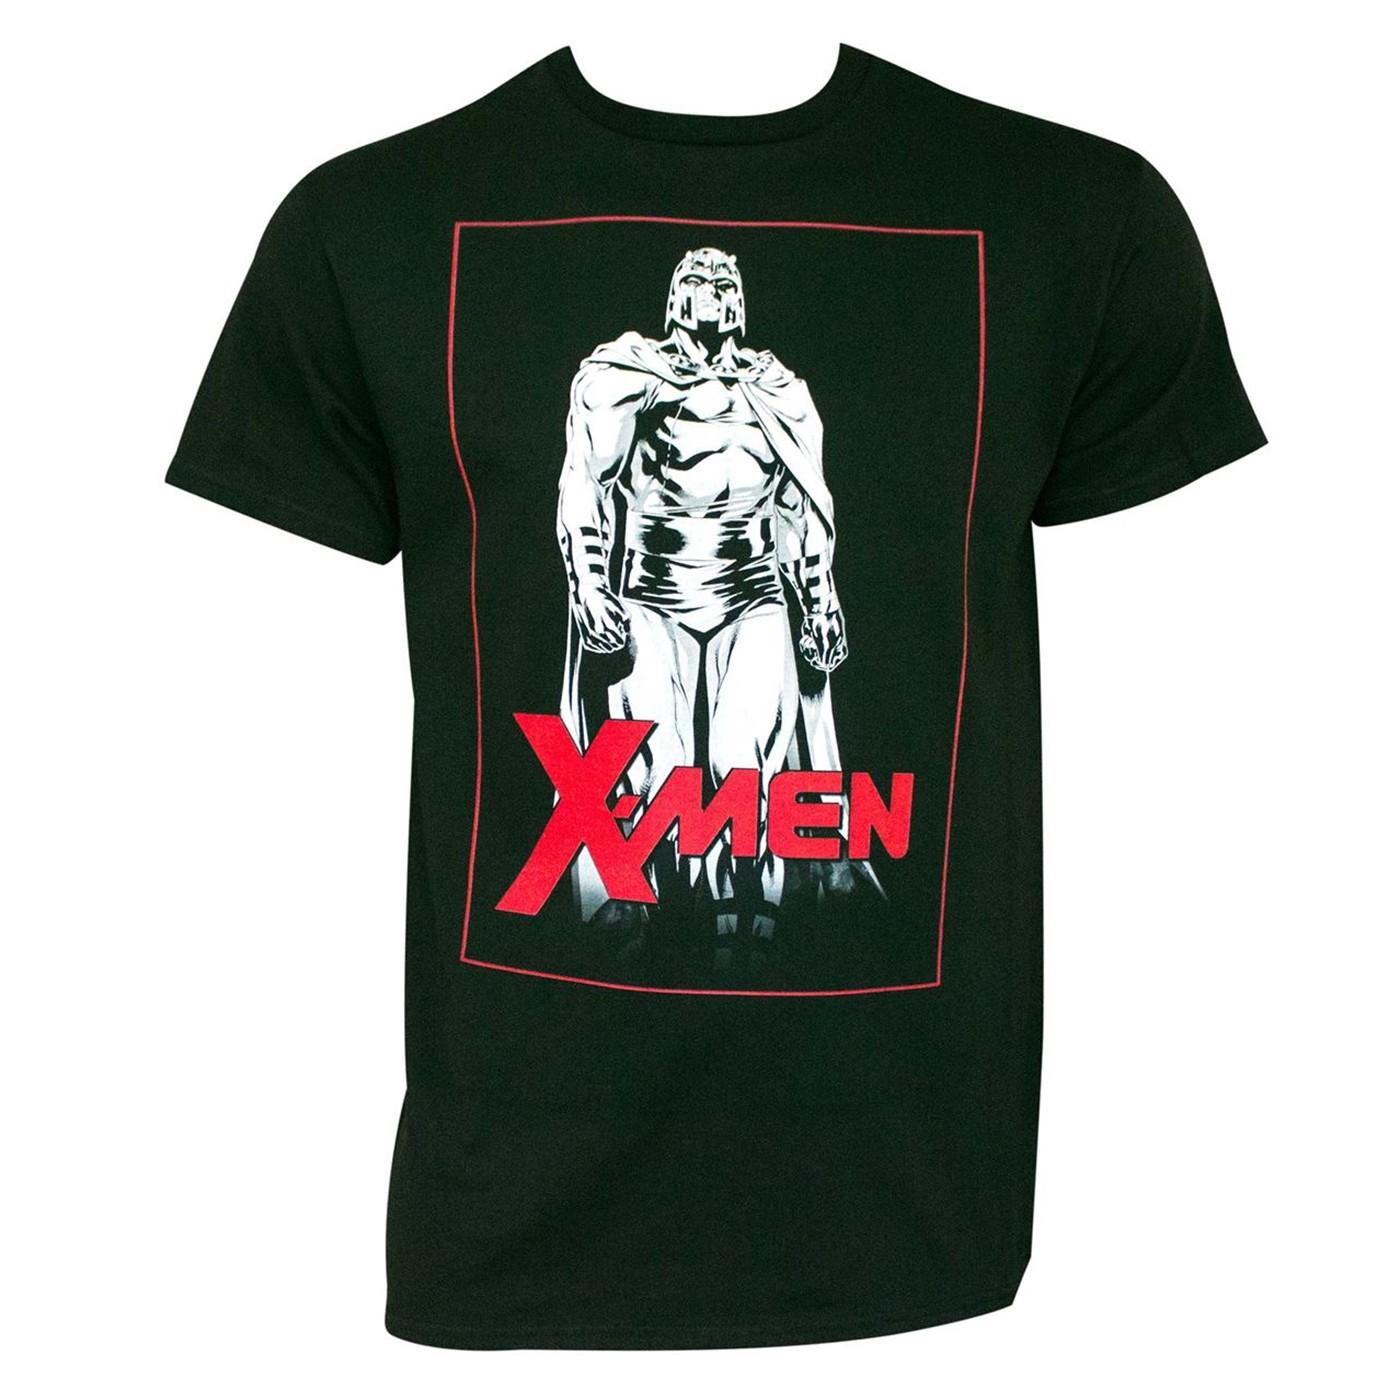 X-Men The Powerful Mutant Magneto Men's T-Shirt